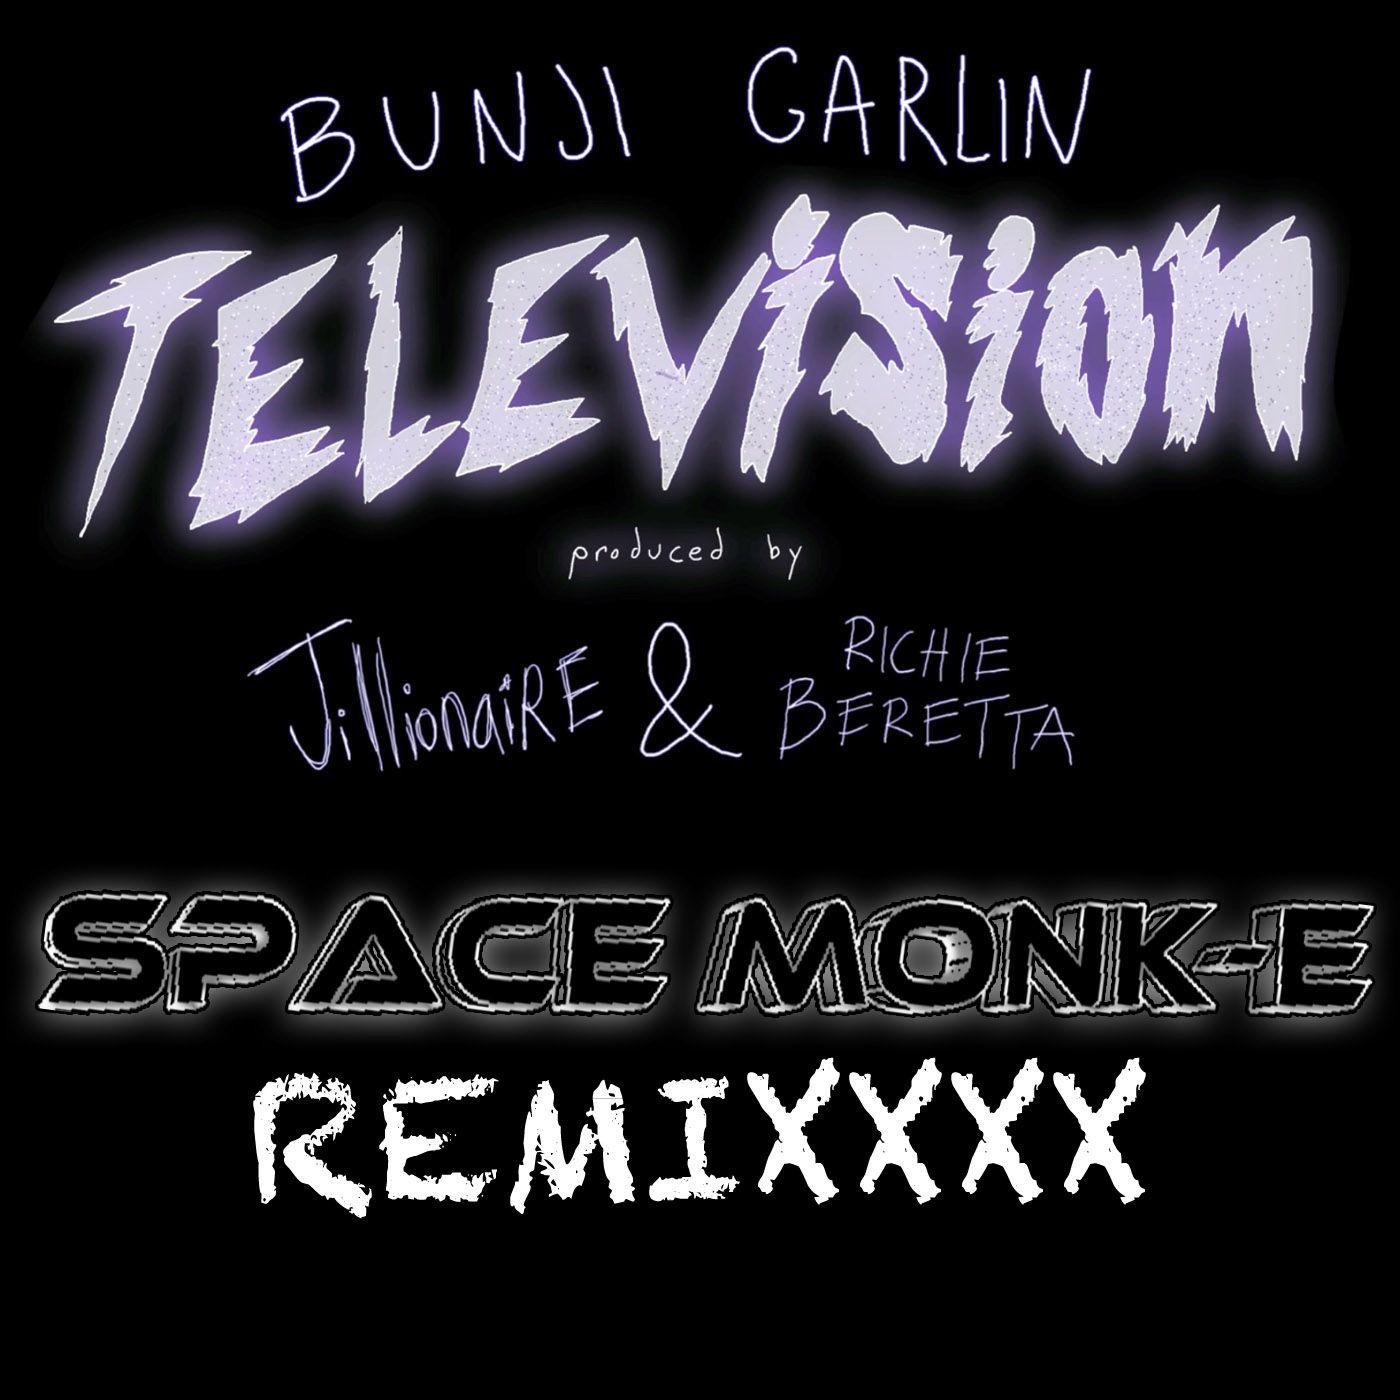 bunji_garlin_-_television_space_monk-e_remixxx.jpg